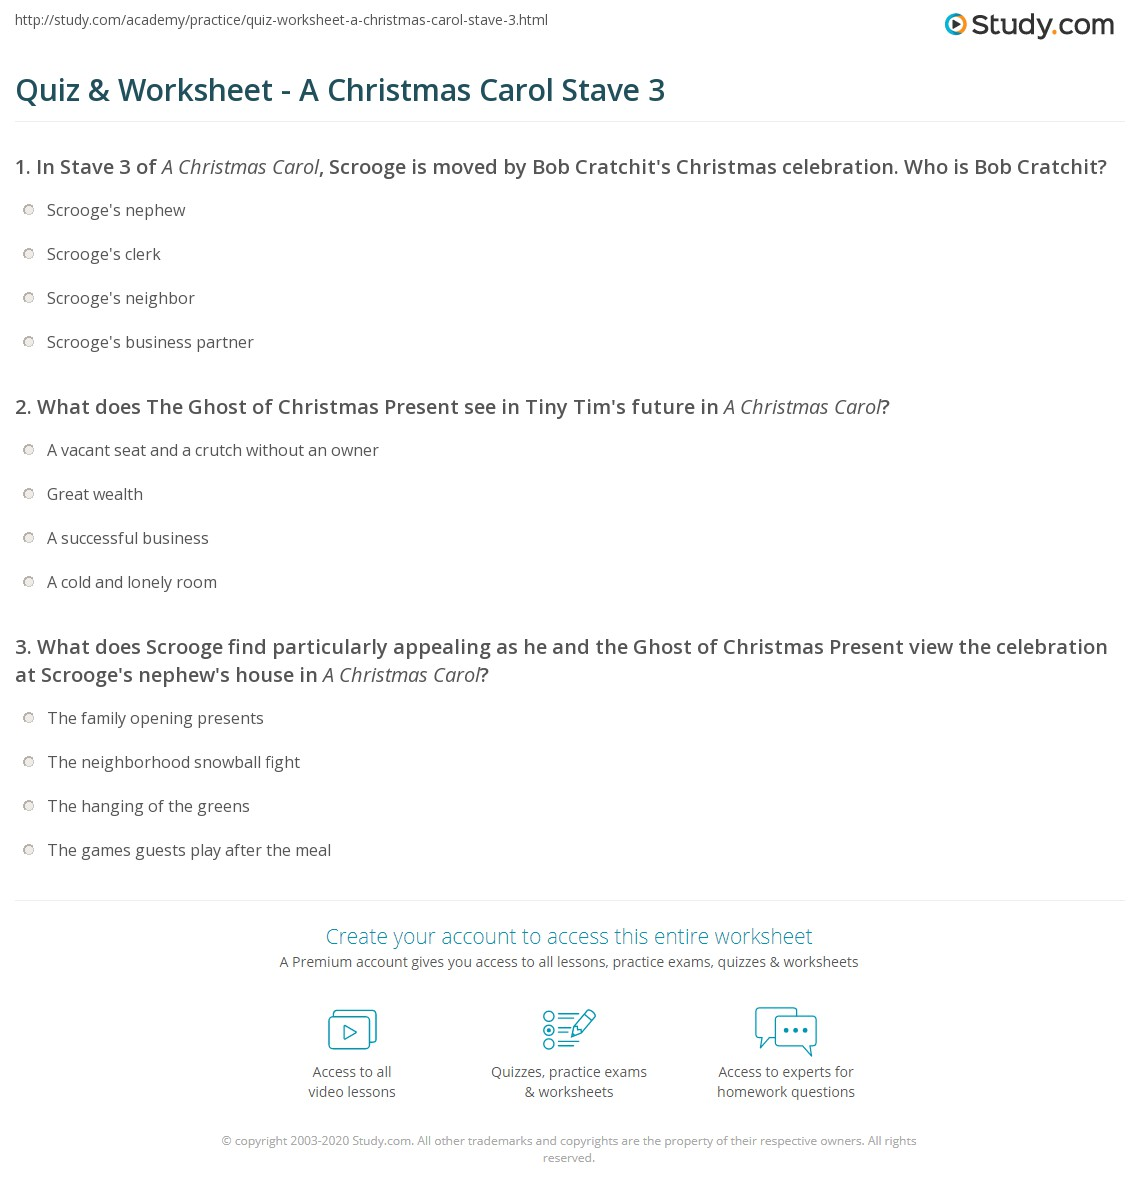 Quiz & Worksheet - A Christmas Carol Stave 3 | Study.com